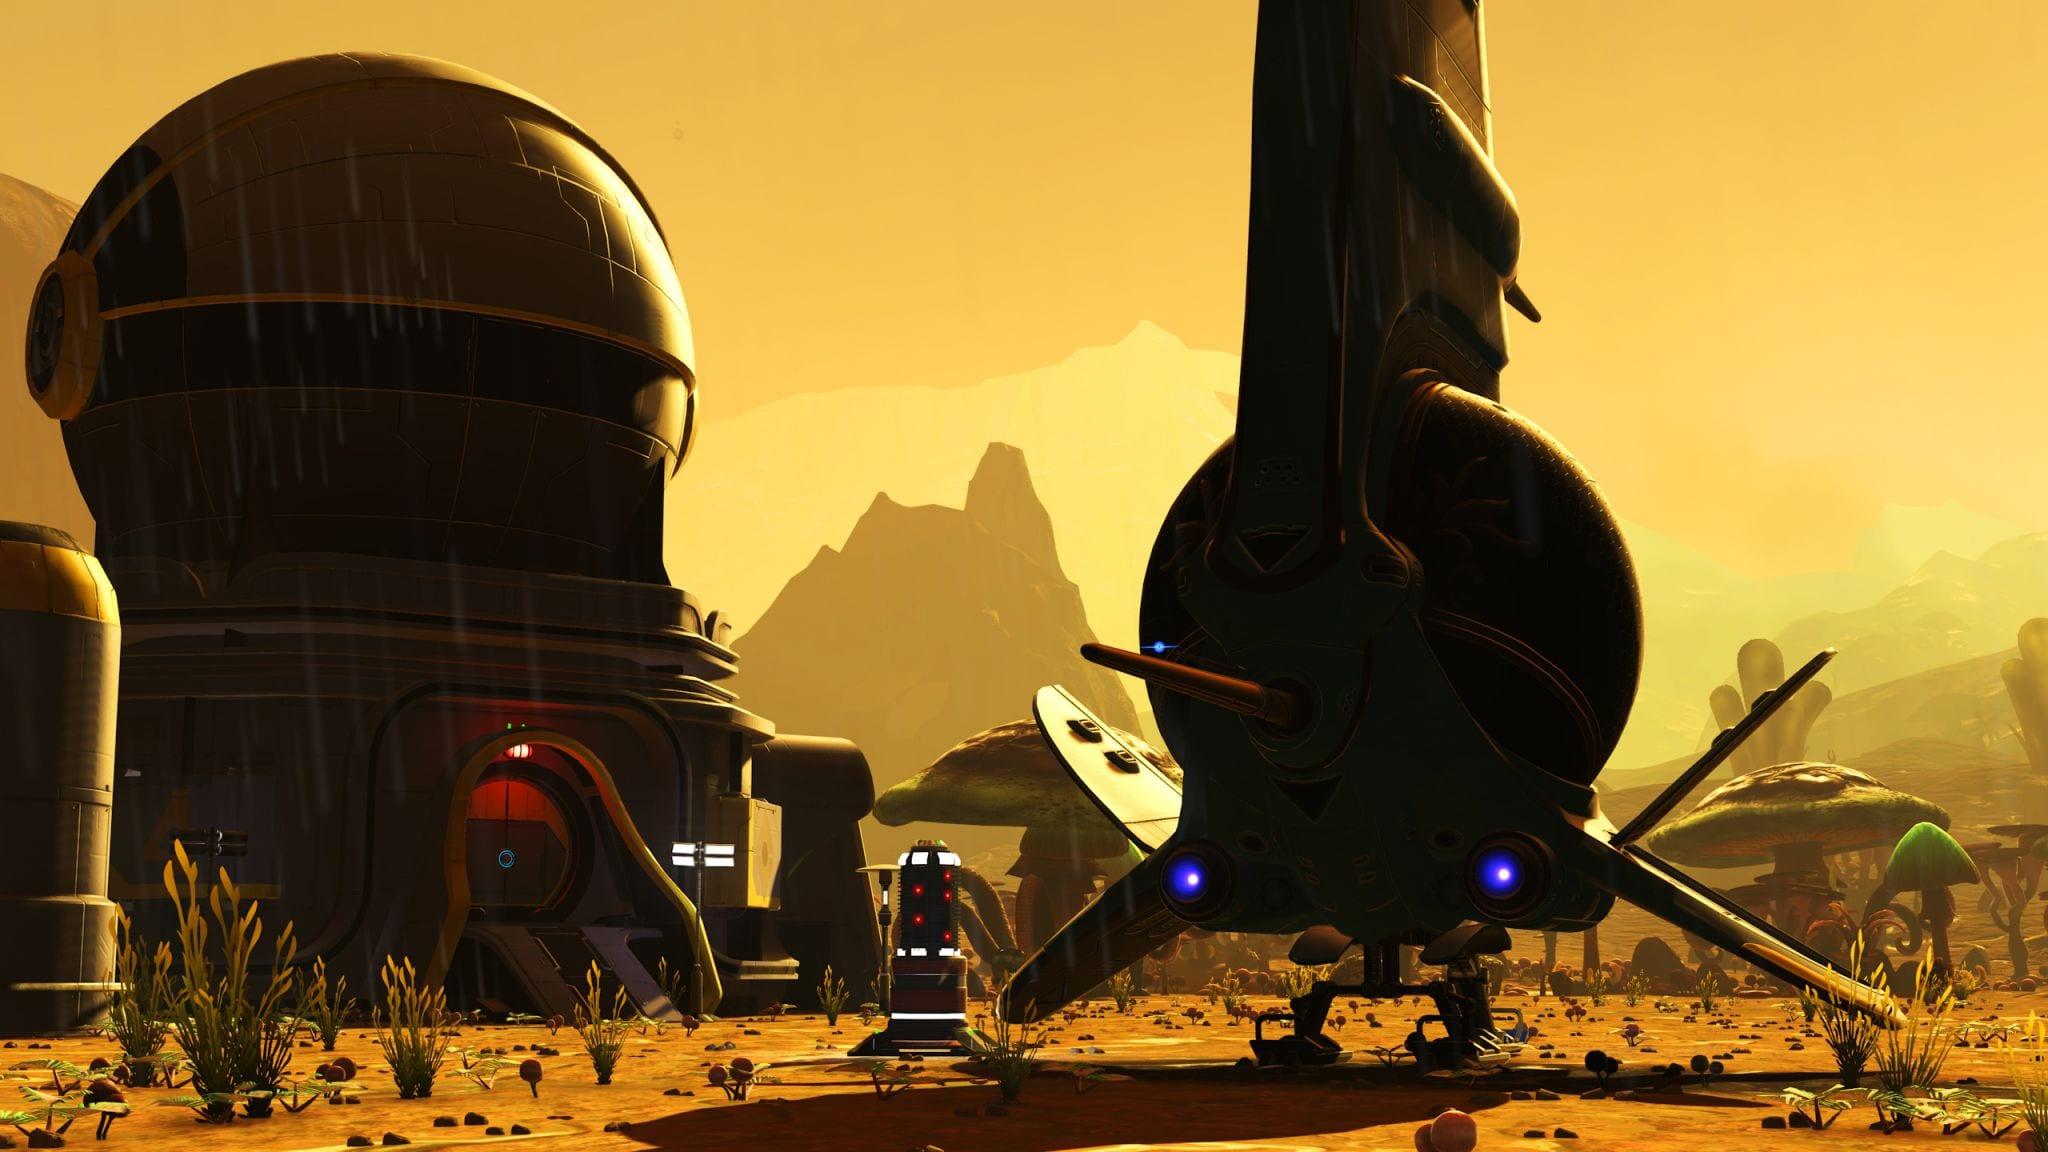 No Man's Sky v1.3 Atlas Rises update released